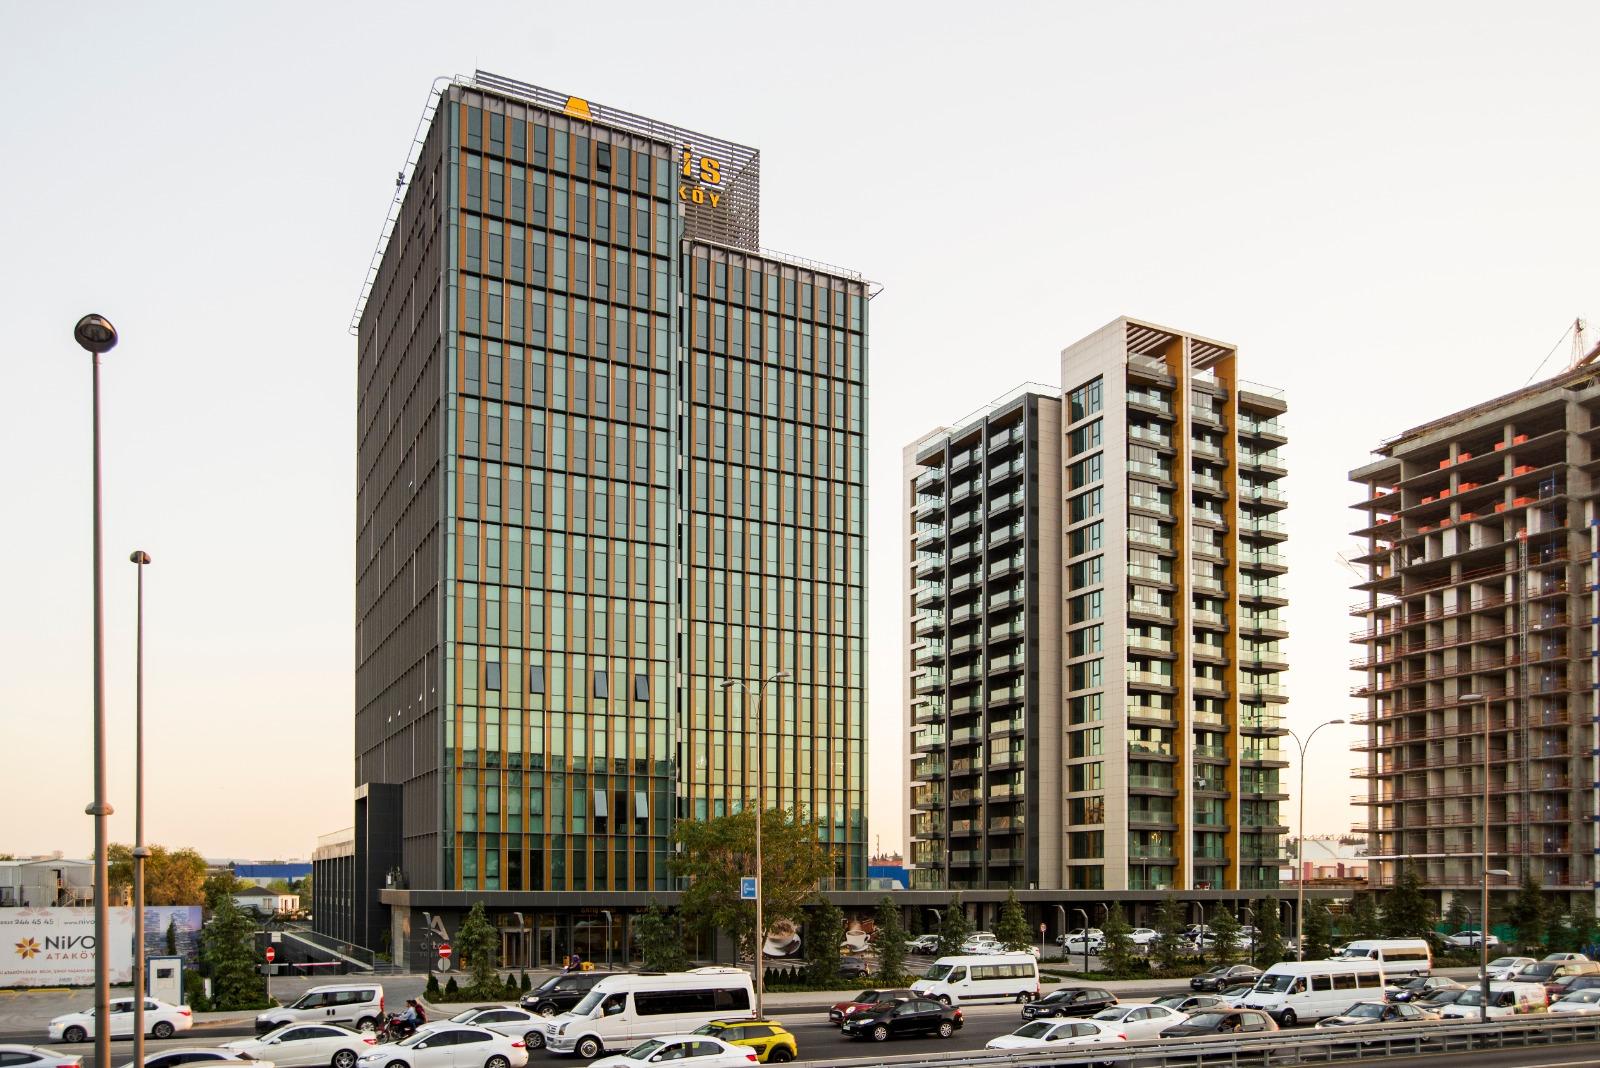 Бизнес-центр с жилыми апартаментами в Атакёе - Фото 22